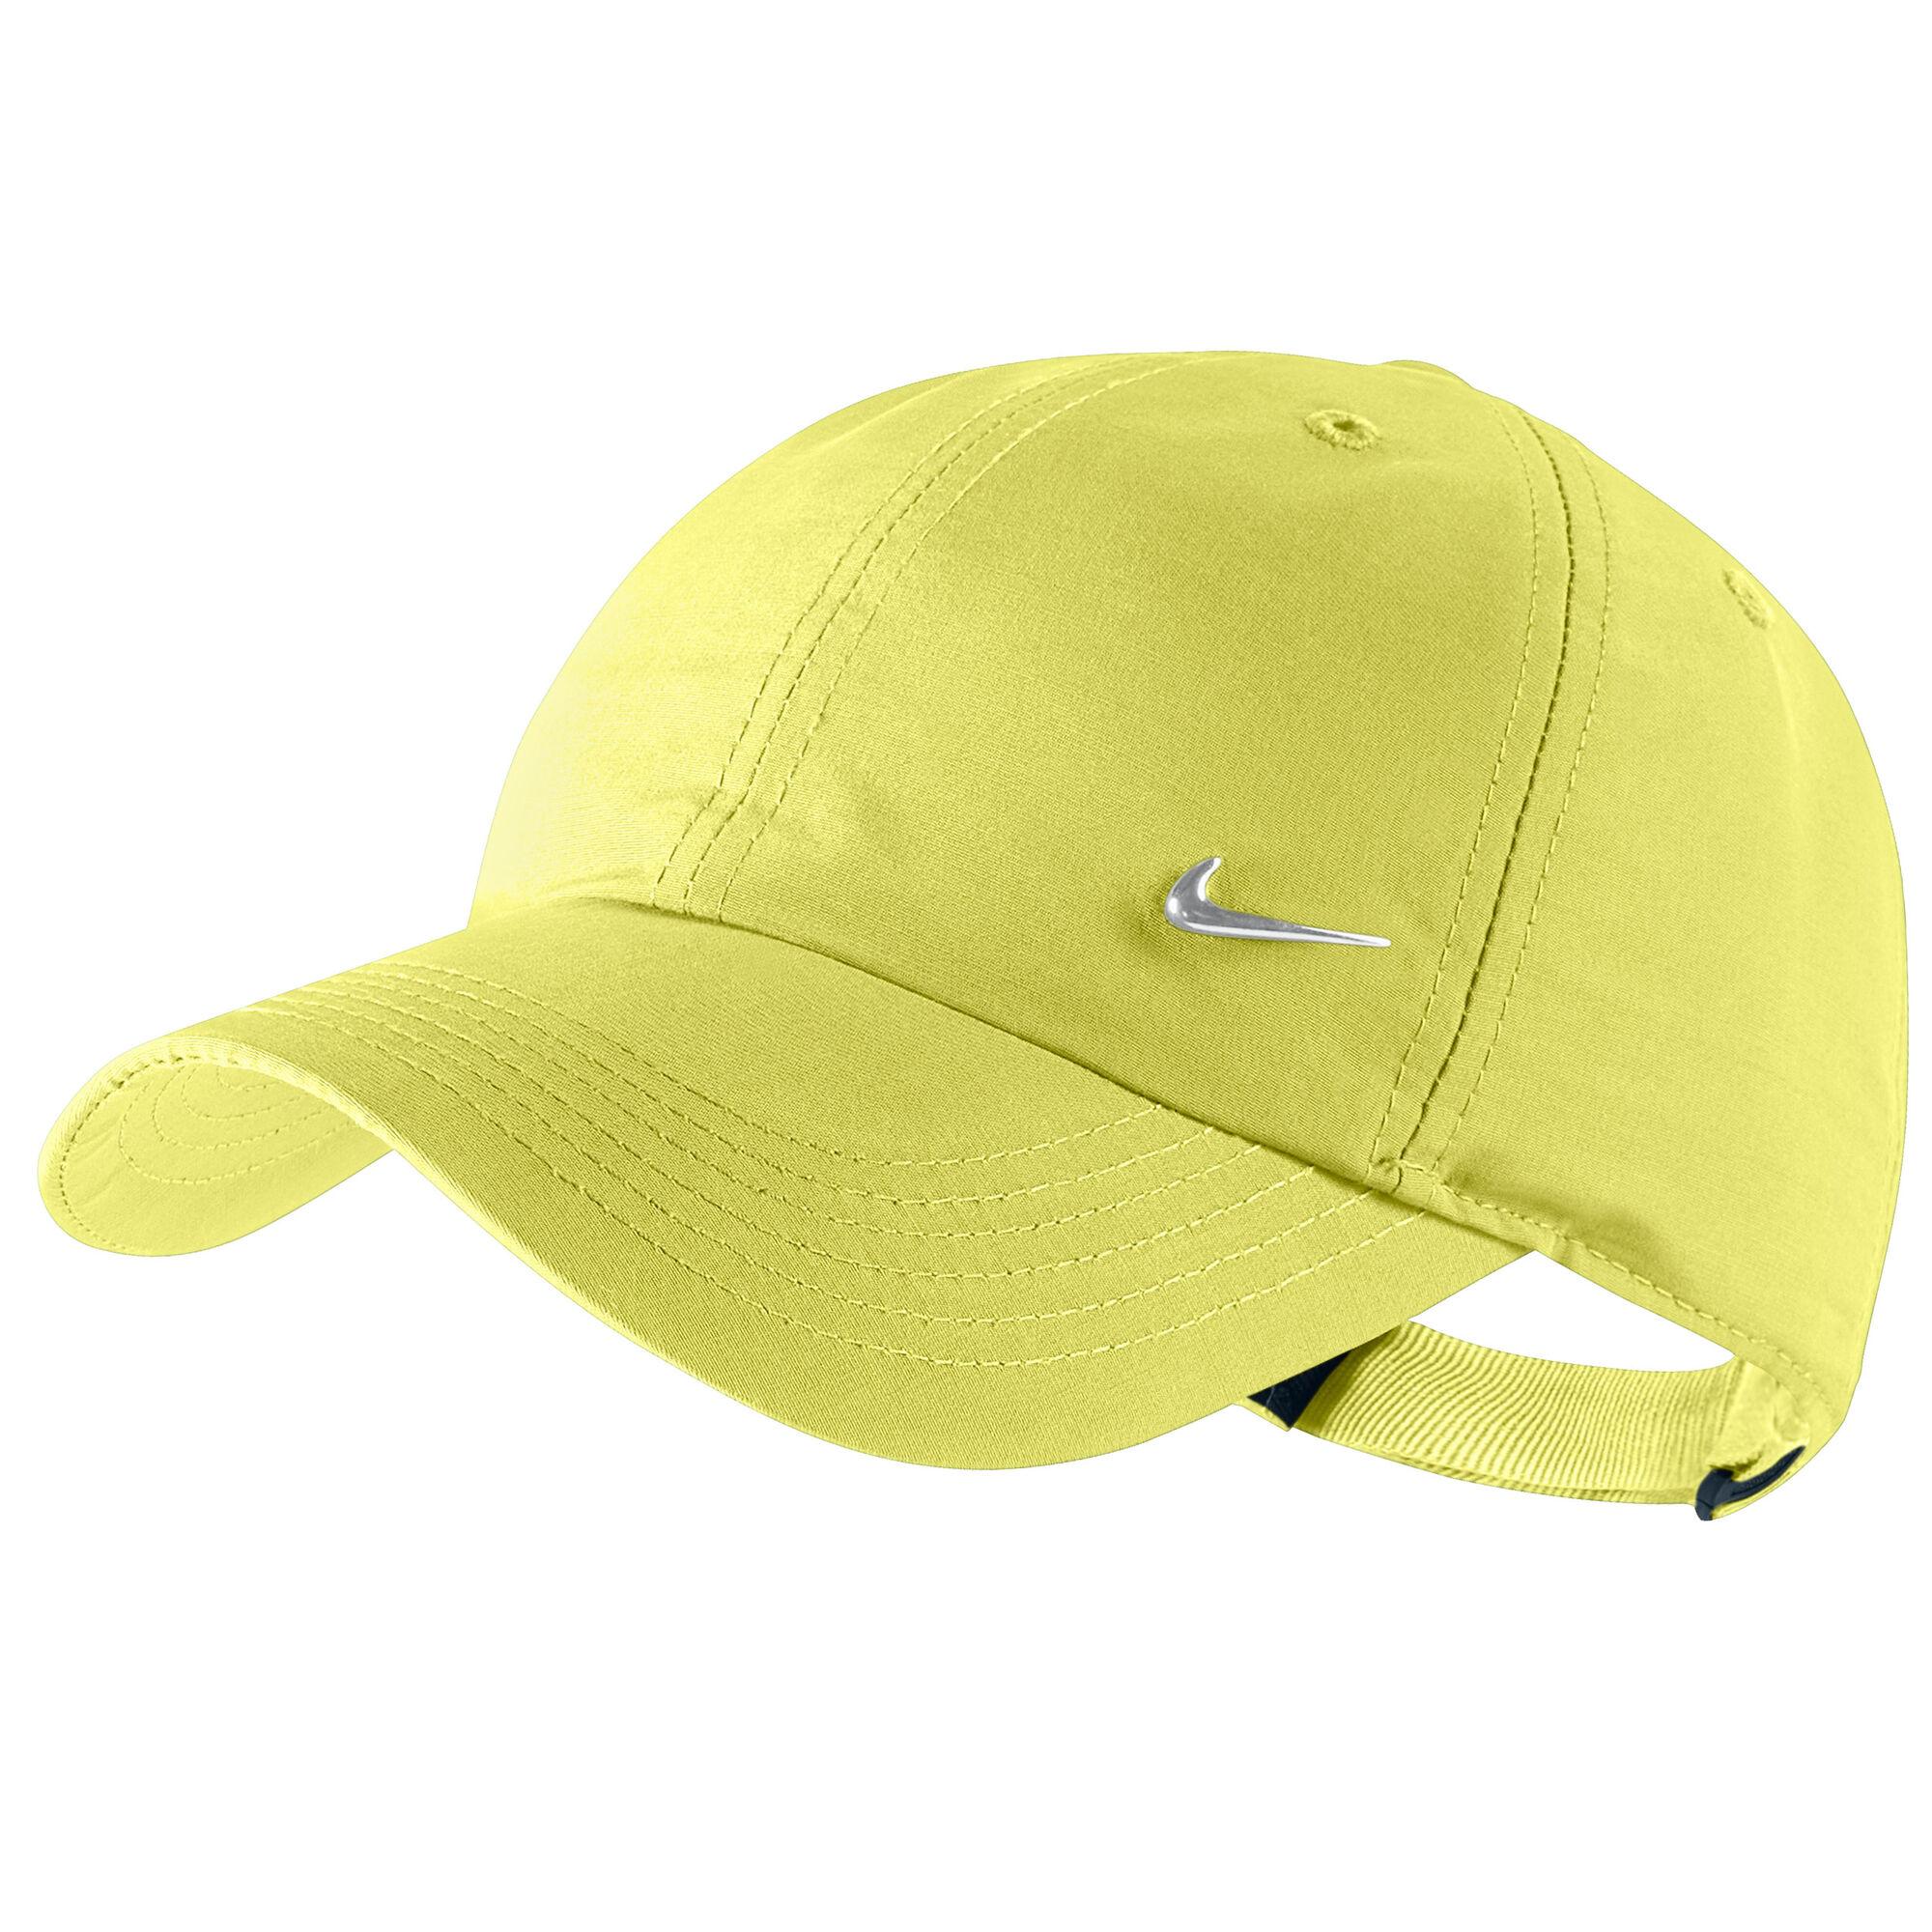 6e02db5aabf07 buy Nike Heritage 86 Metal Swoosh Beanie Kids - Light Green online ...